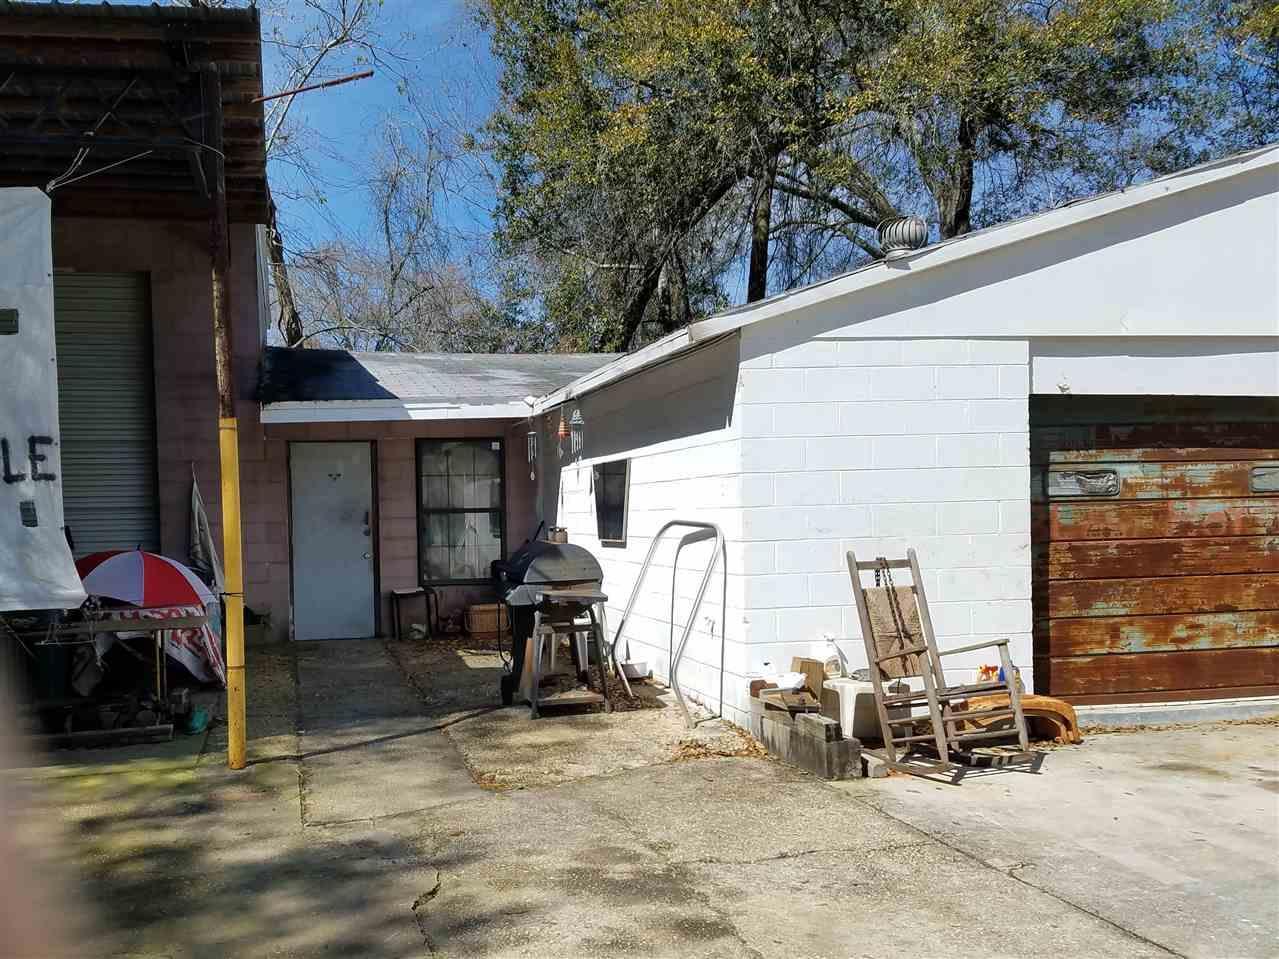 731 N 69th Ave, Pensacola, FL 32506